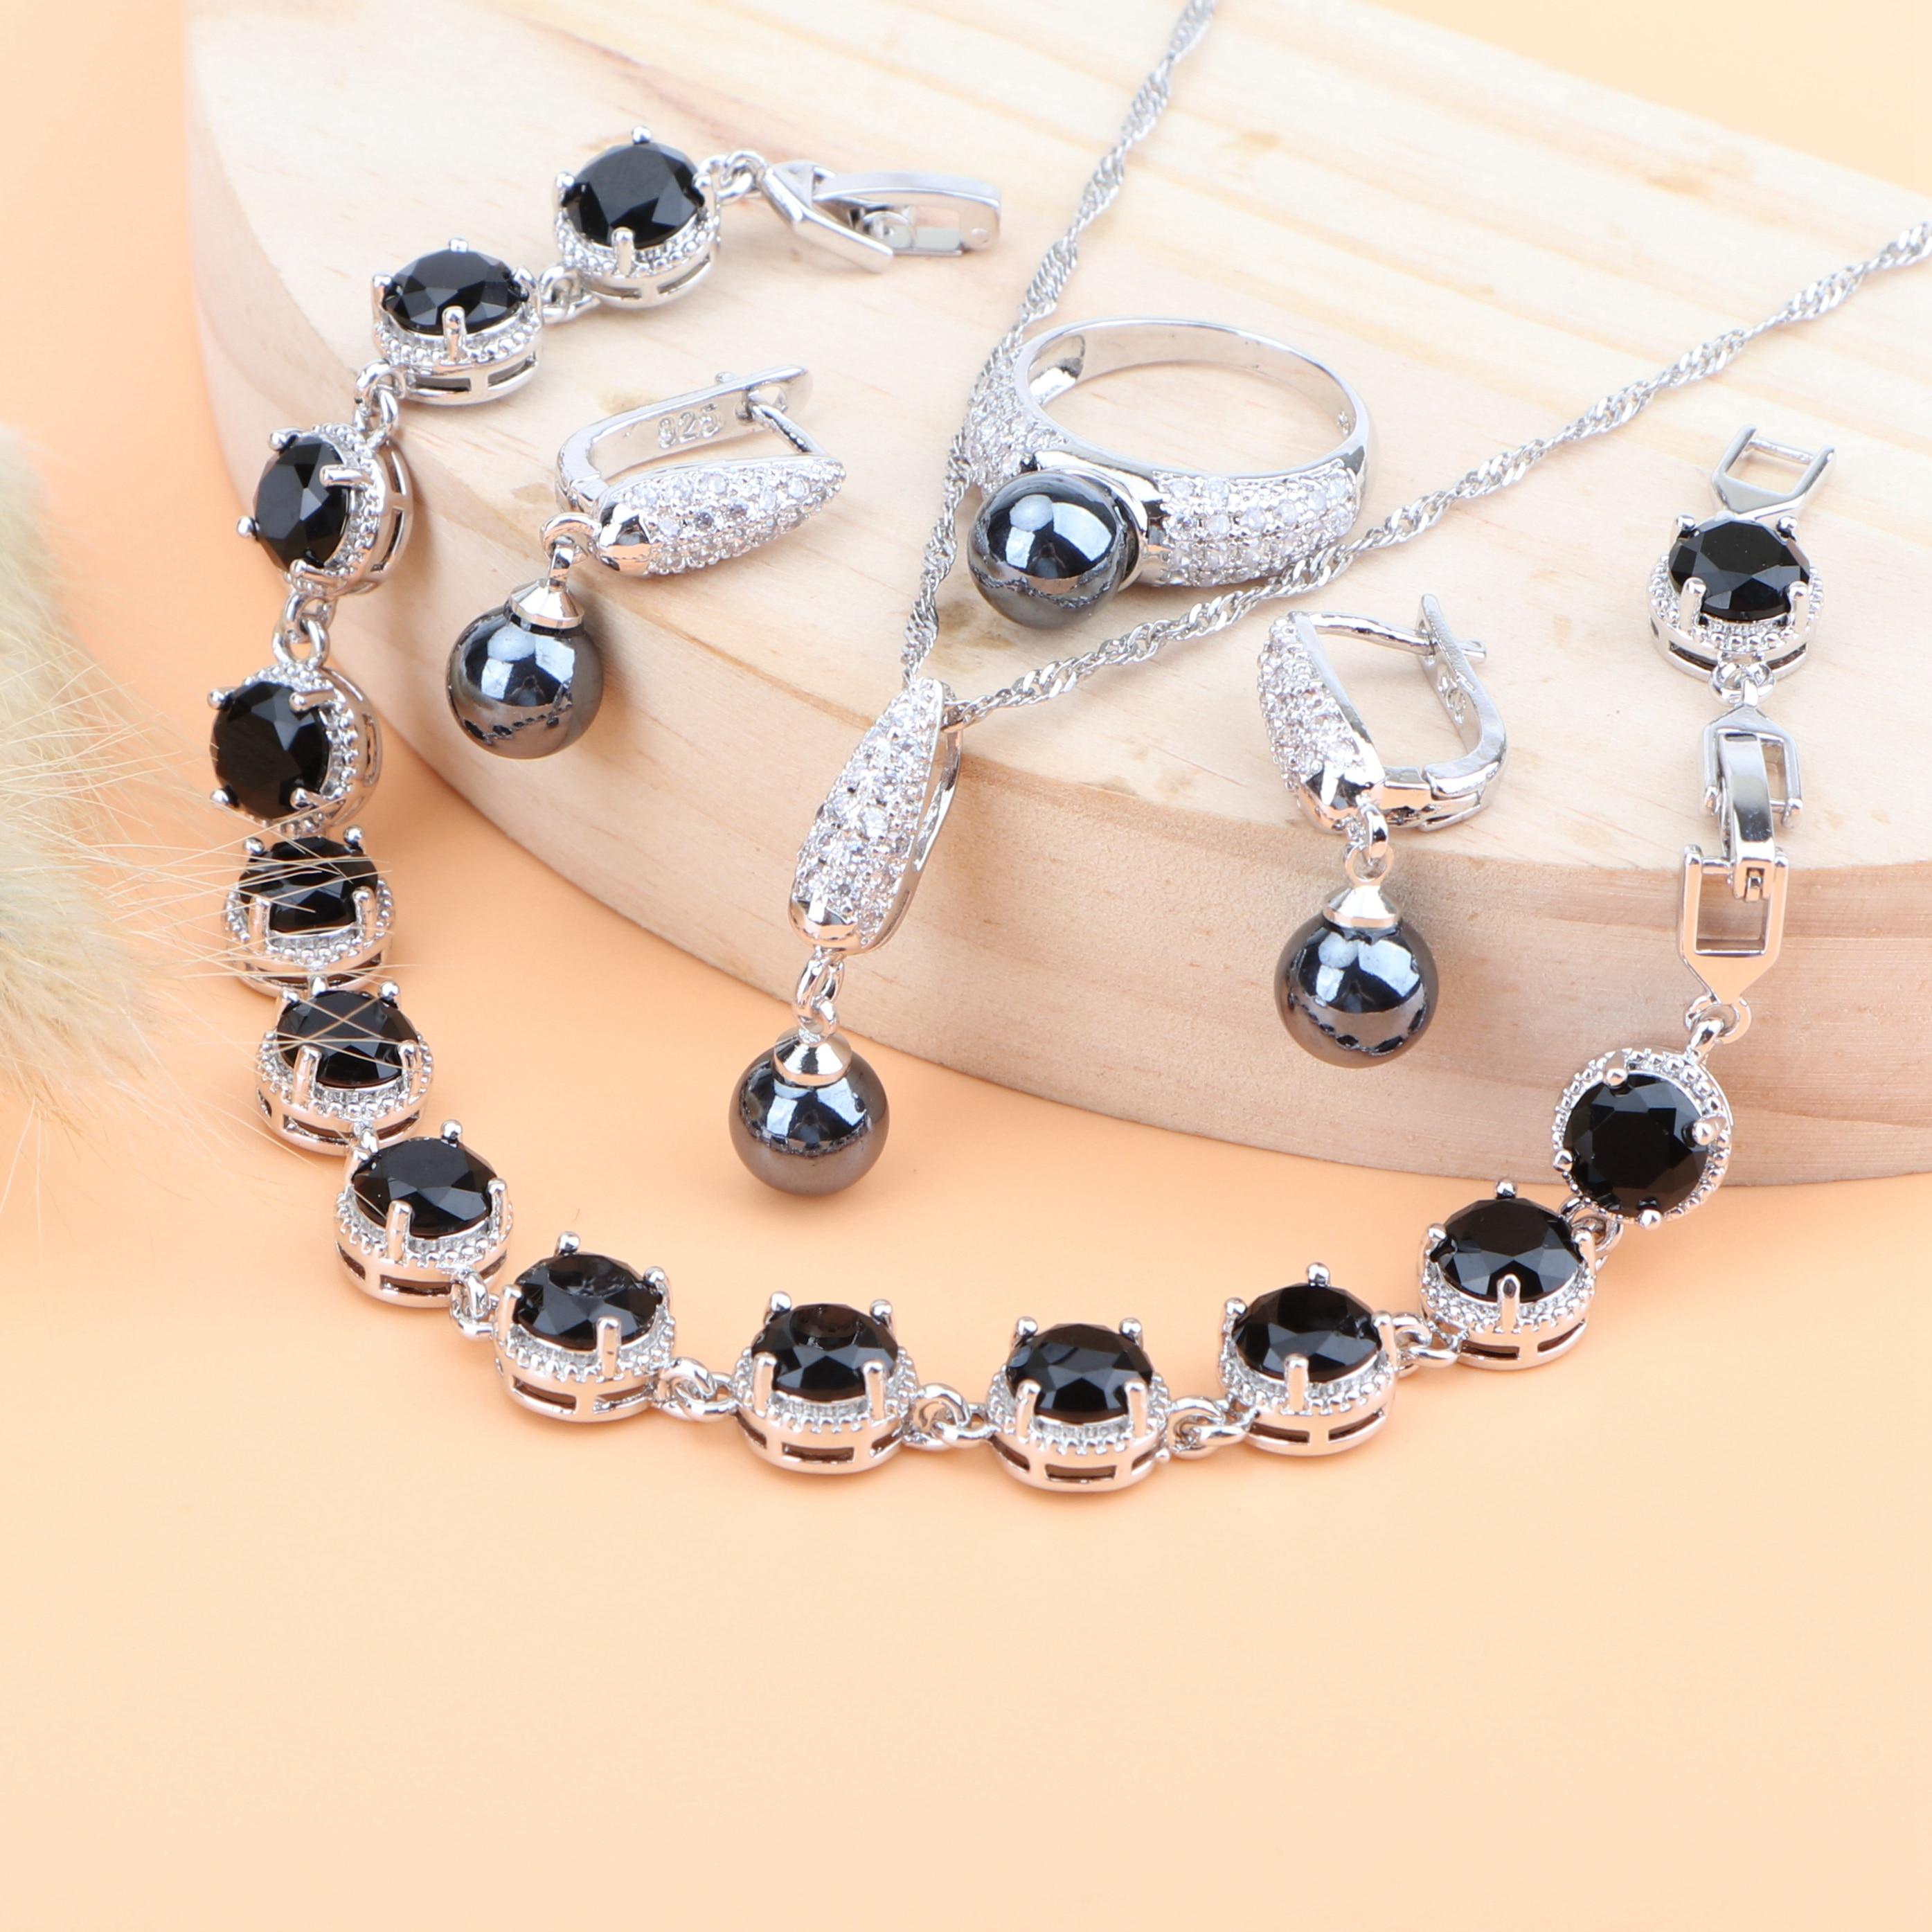 Bridal Jewelry Statement Glass beads Bracelets Handgefertigt Beaded Bracelets with pendant